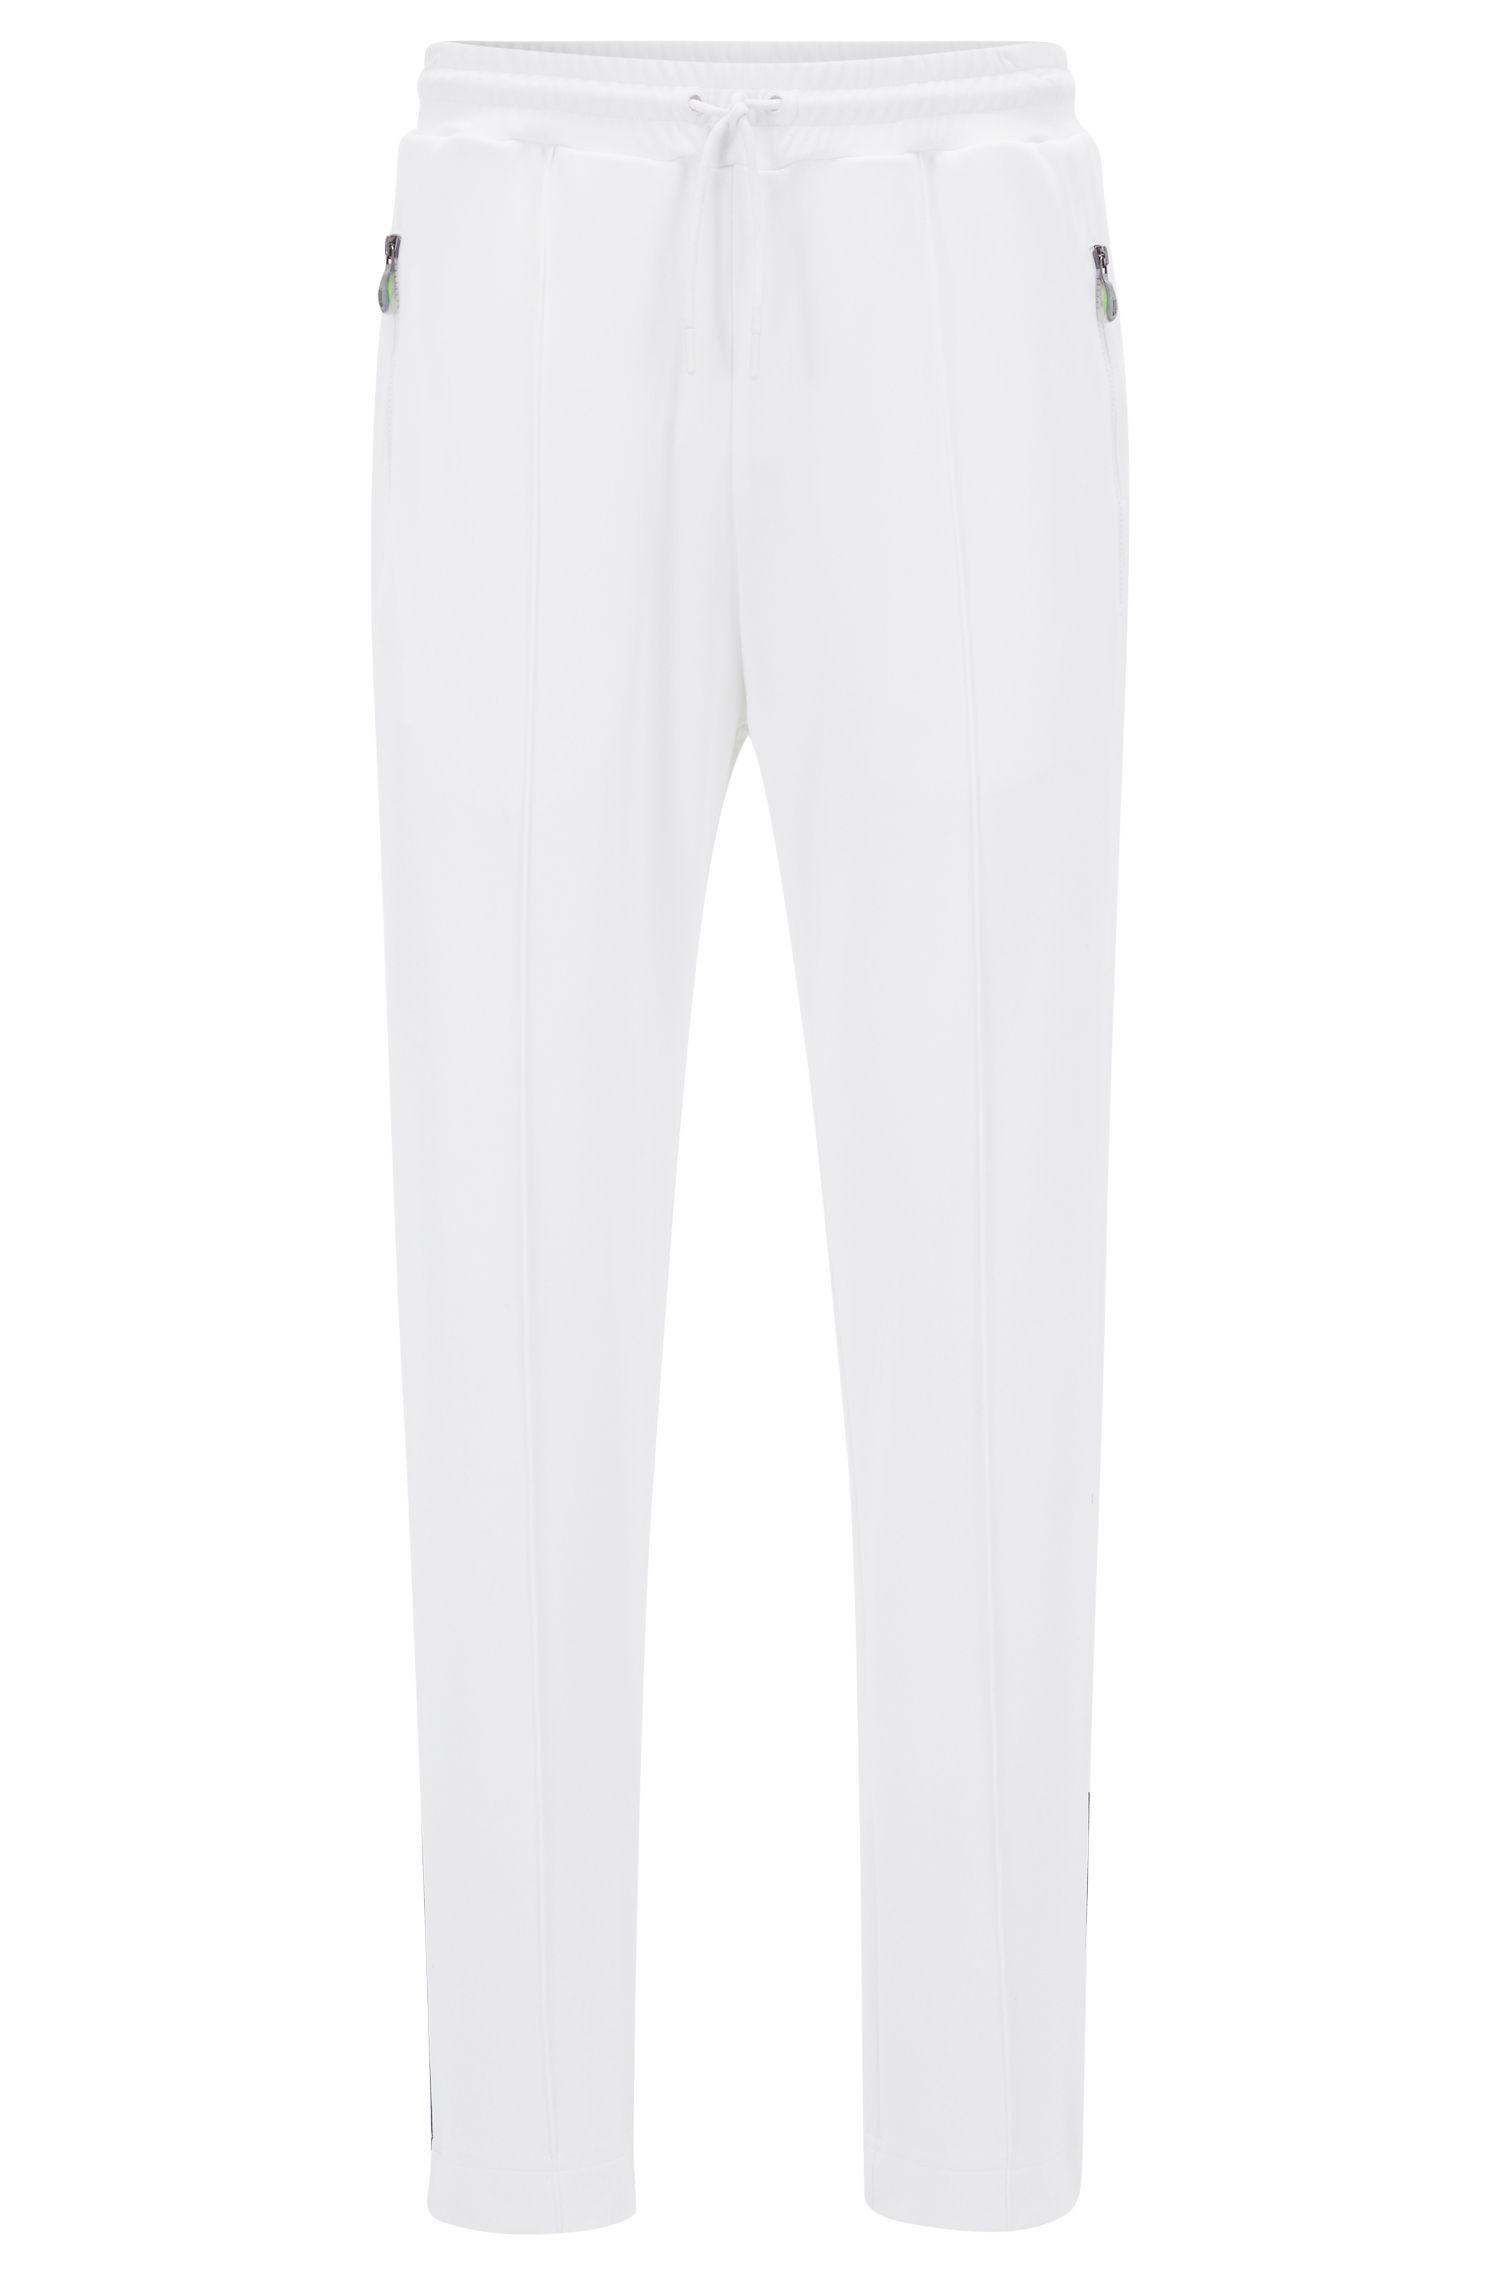 Pantalones de chándal de pernera recta en piqué interlock